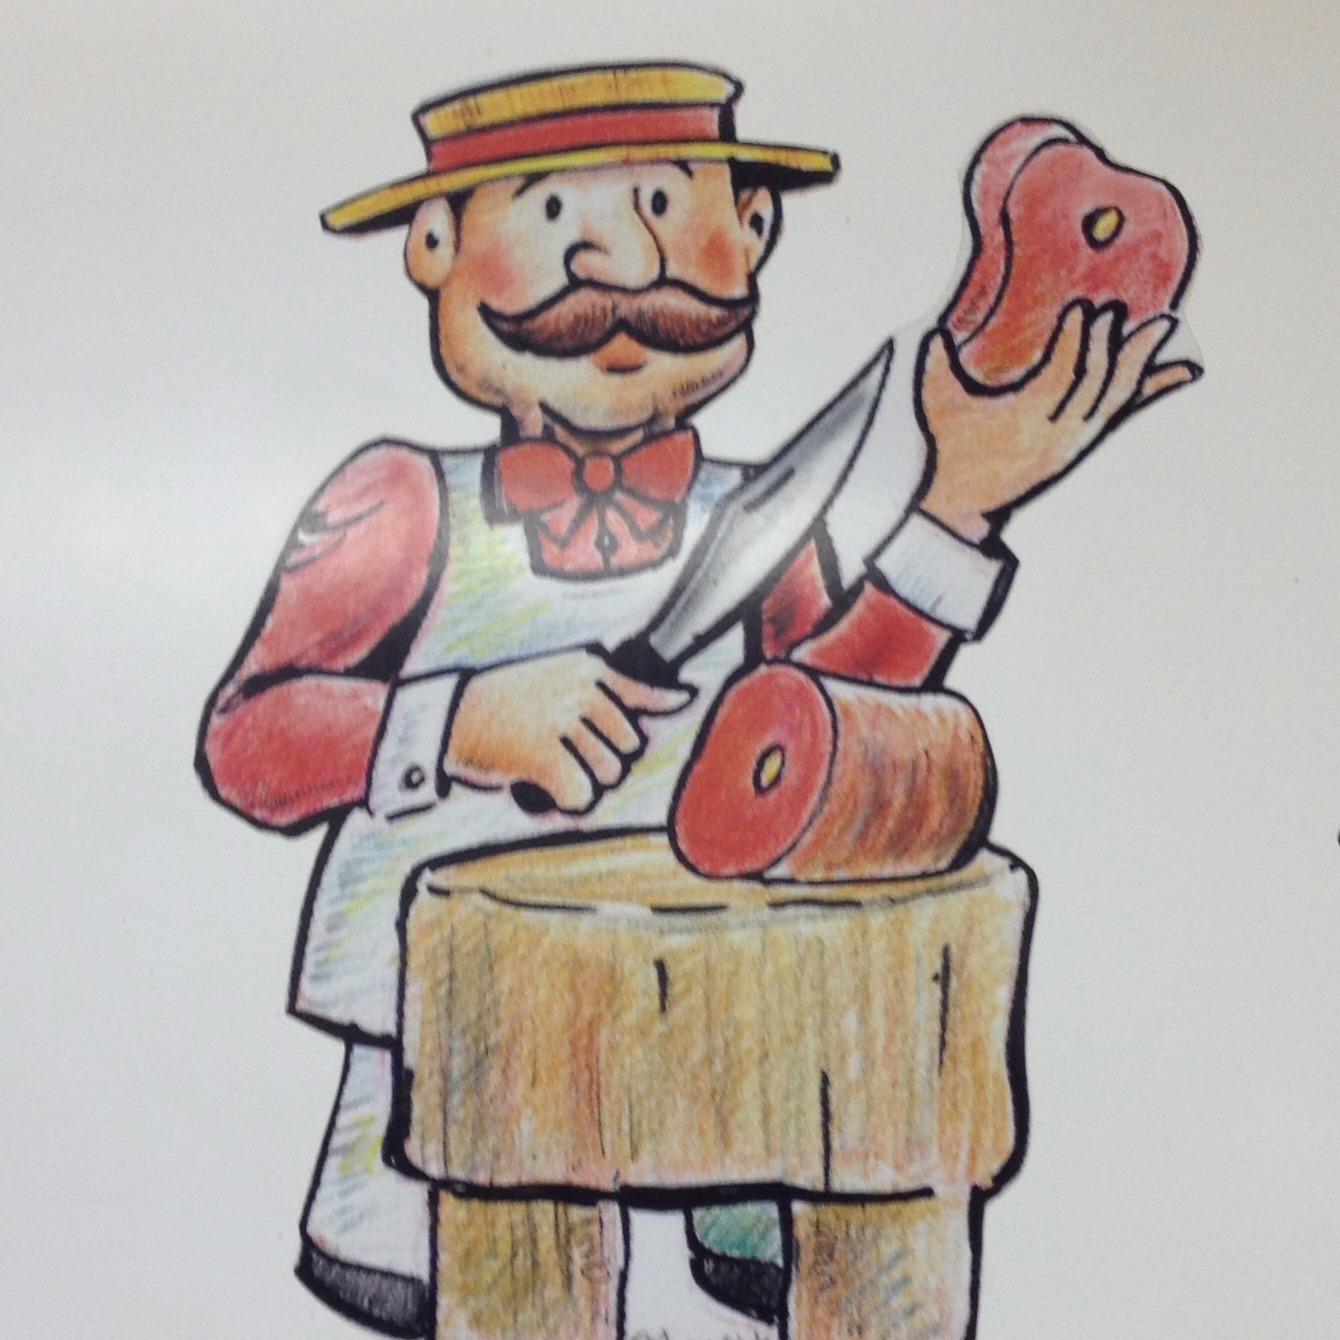 Stokkes Meat Market image 9